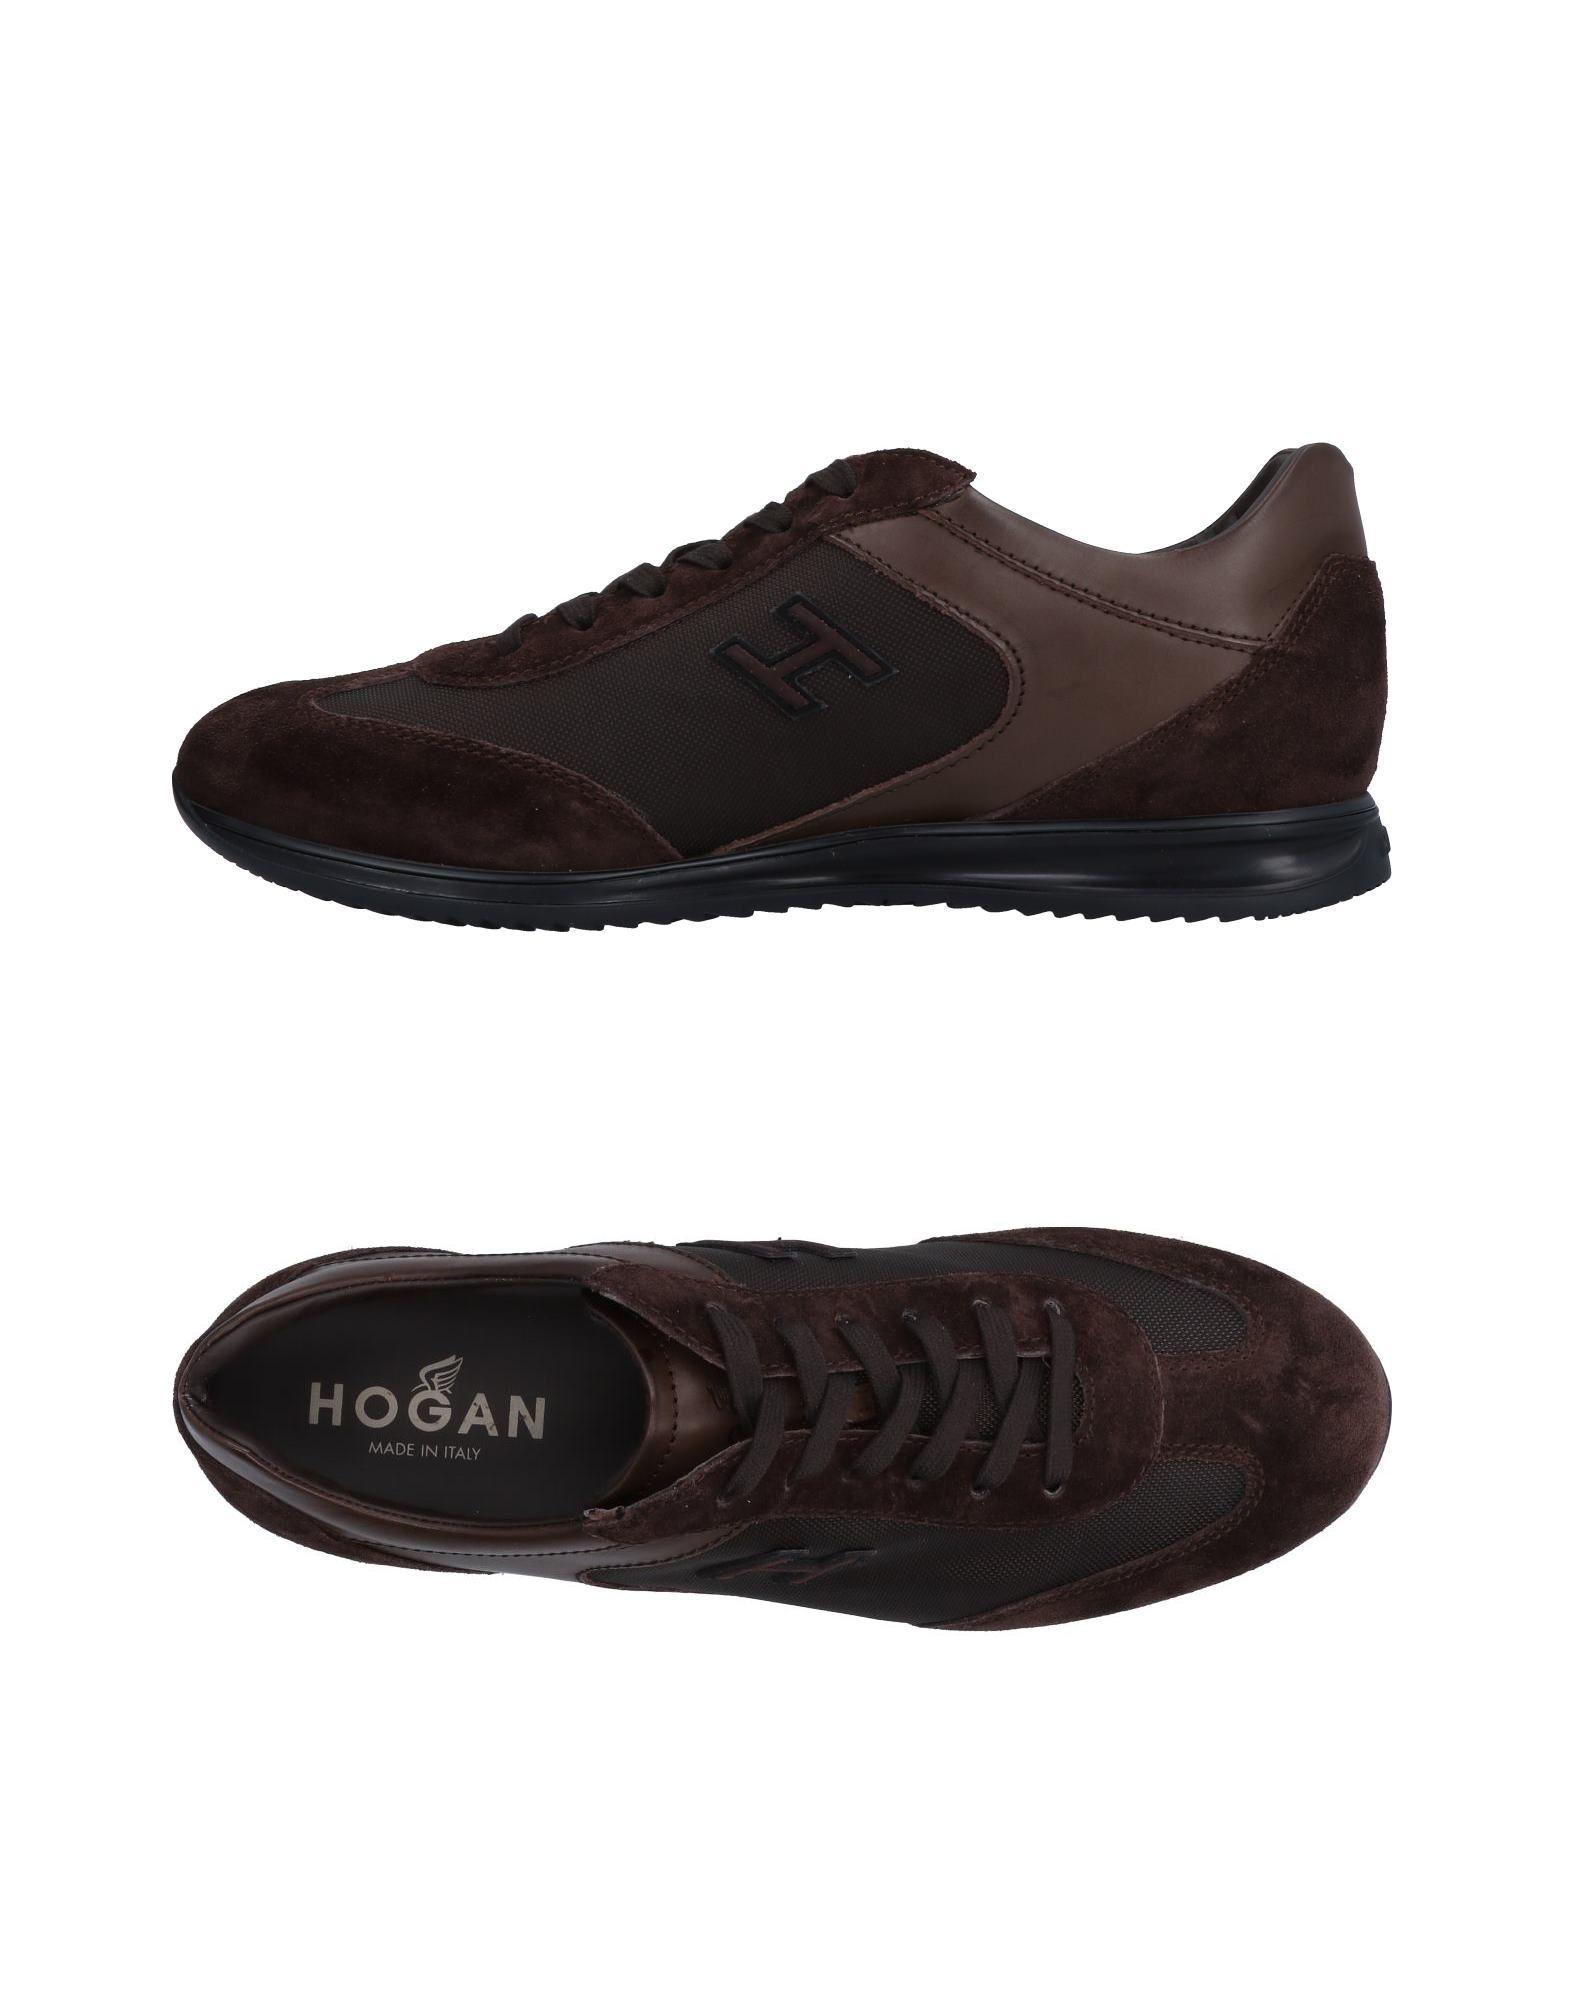 Hogan Sneakers Herren  11517284DD Gute Qualität beliebte Schuhe